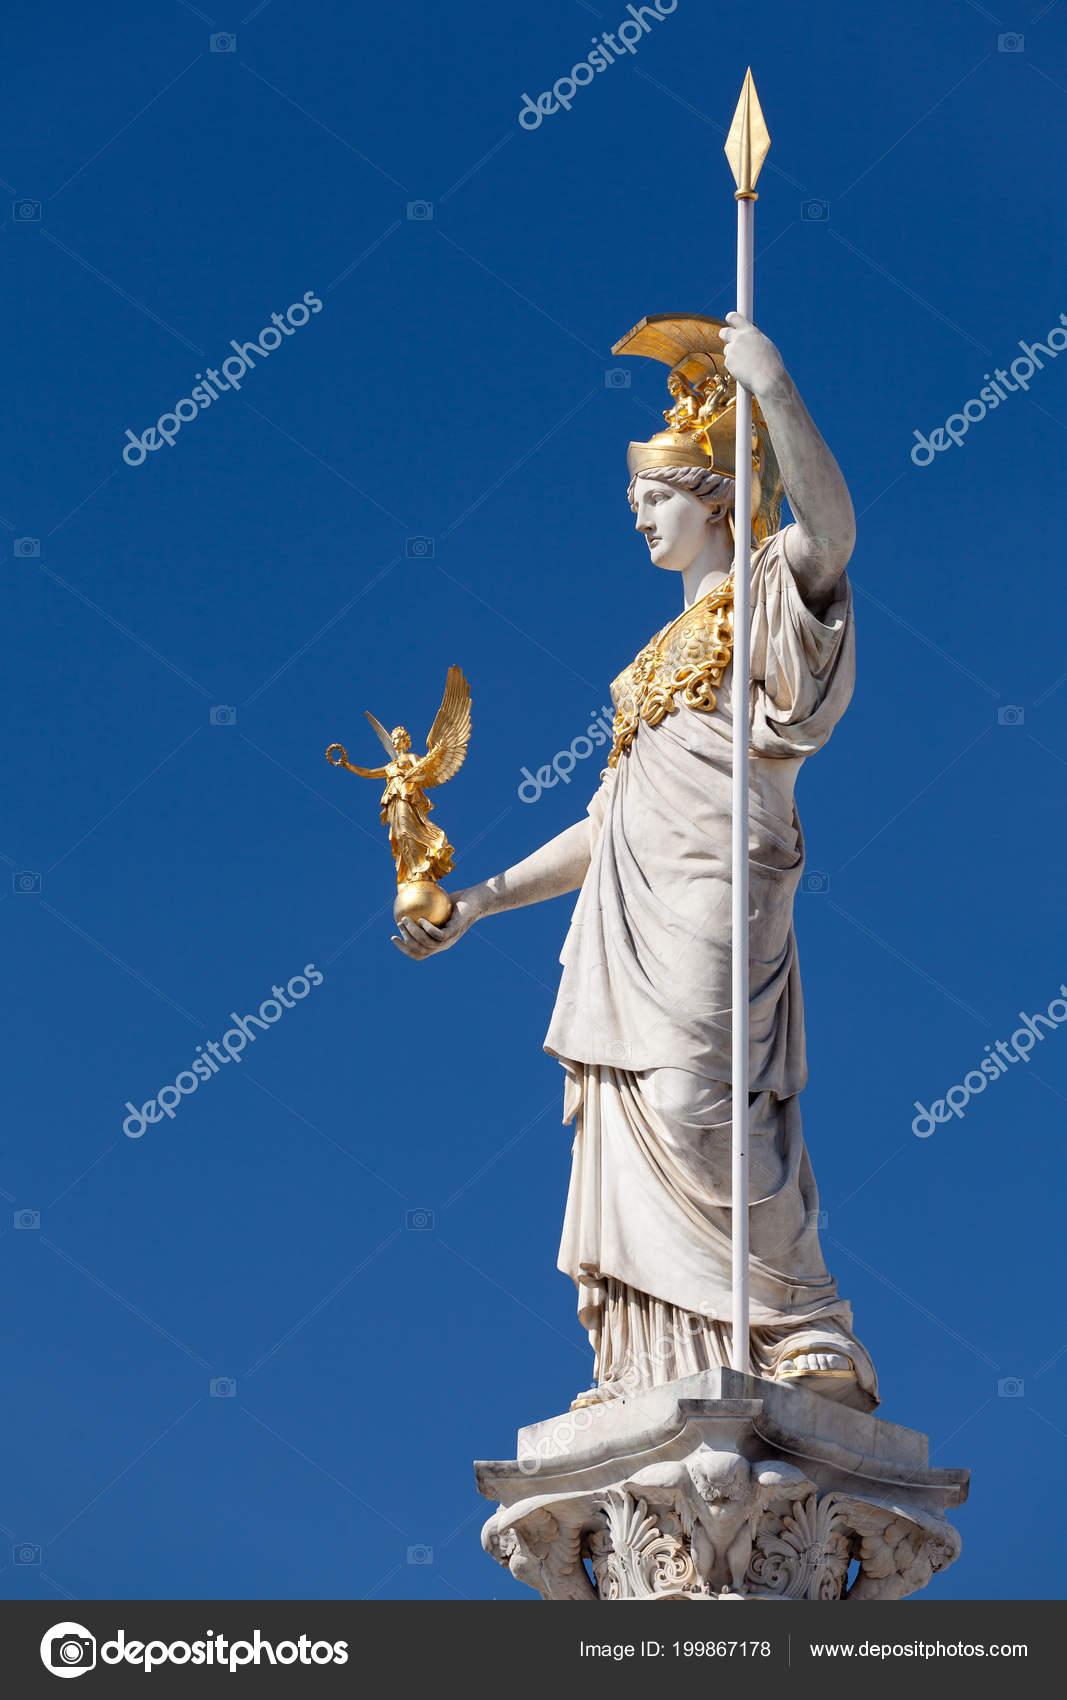 Athena Goddess Greek Mythology Symbol Law Justice Stock Photo